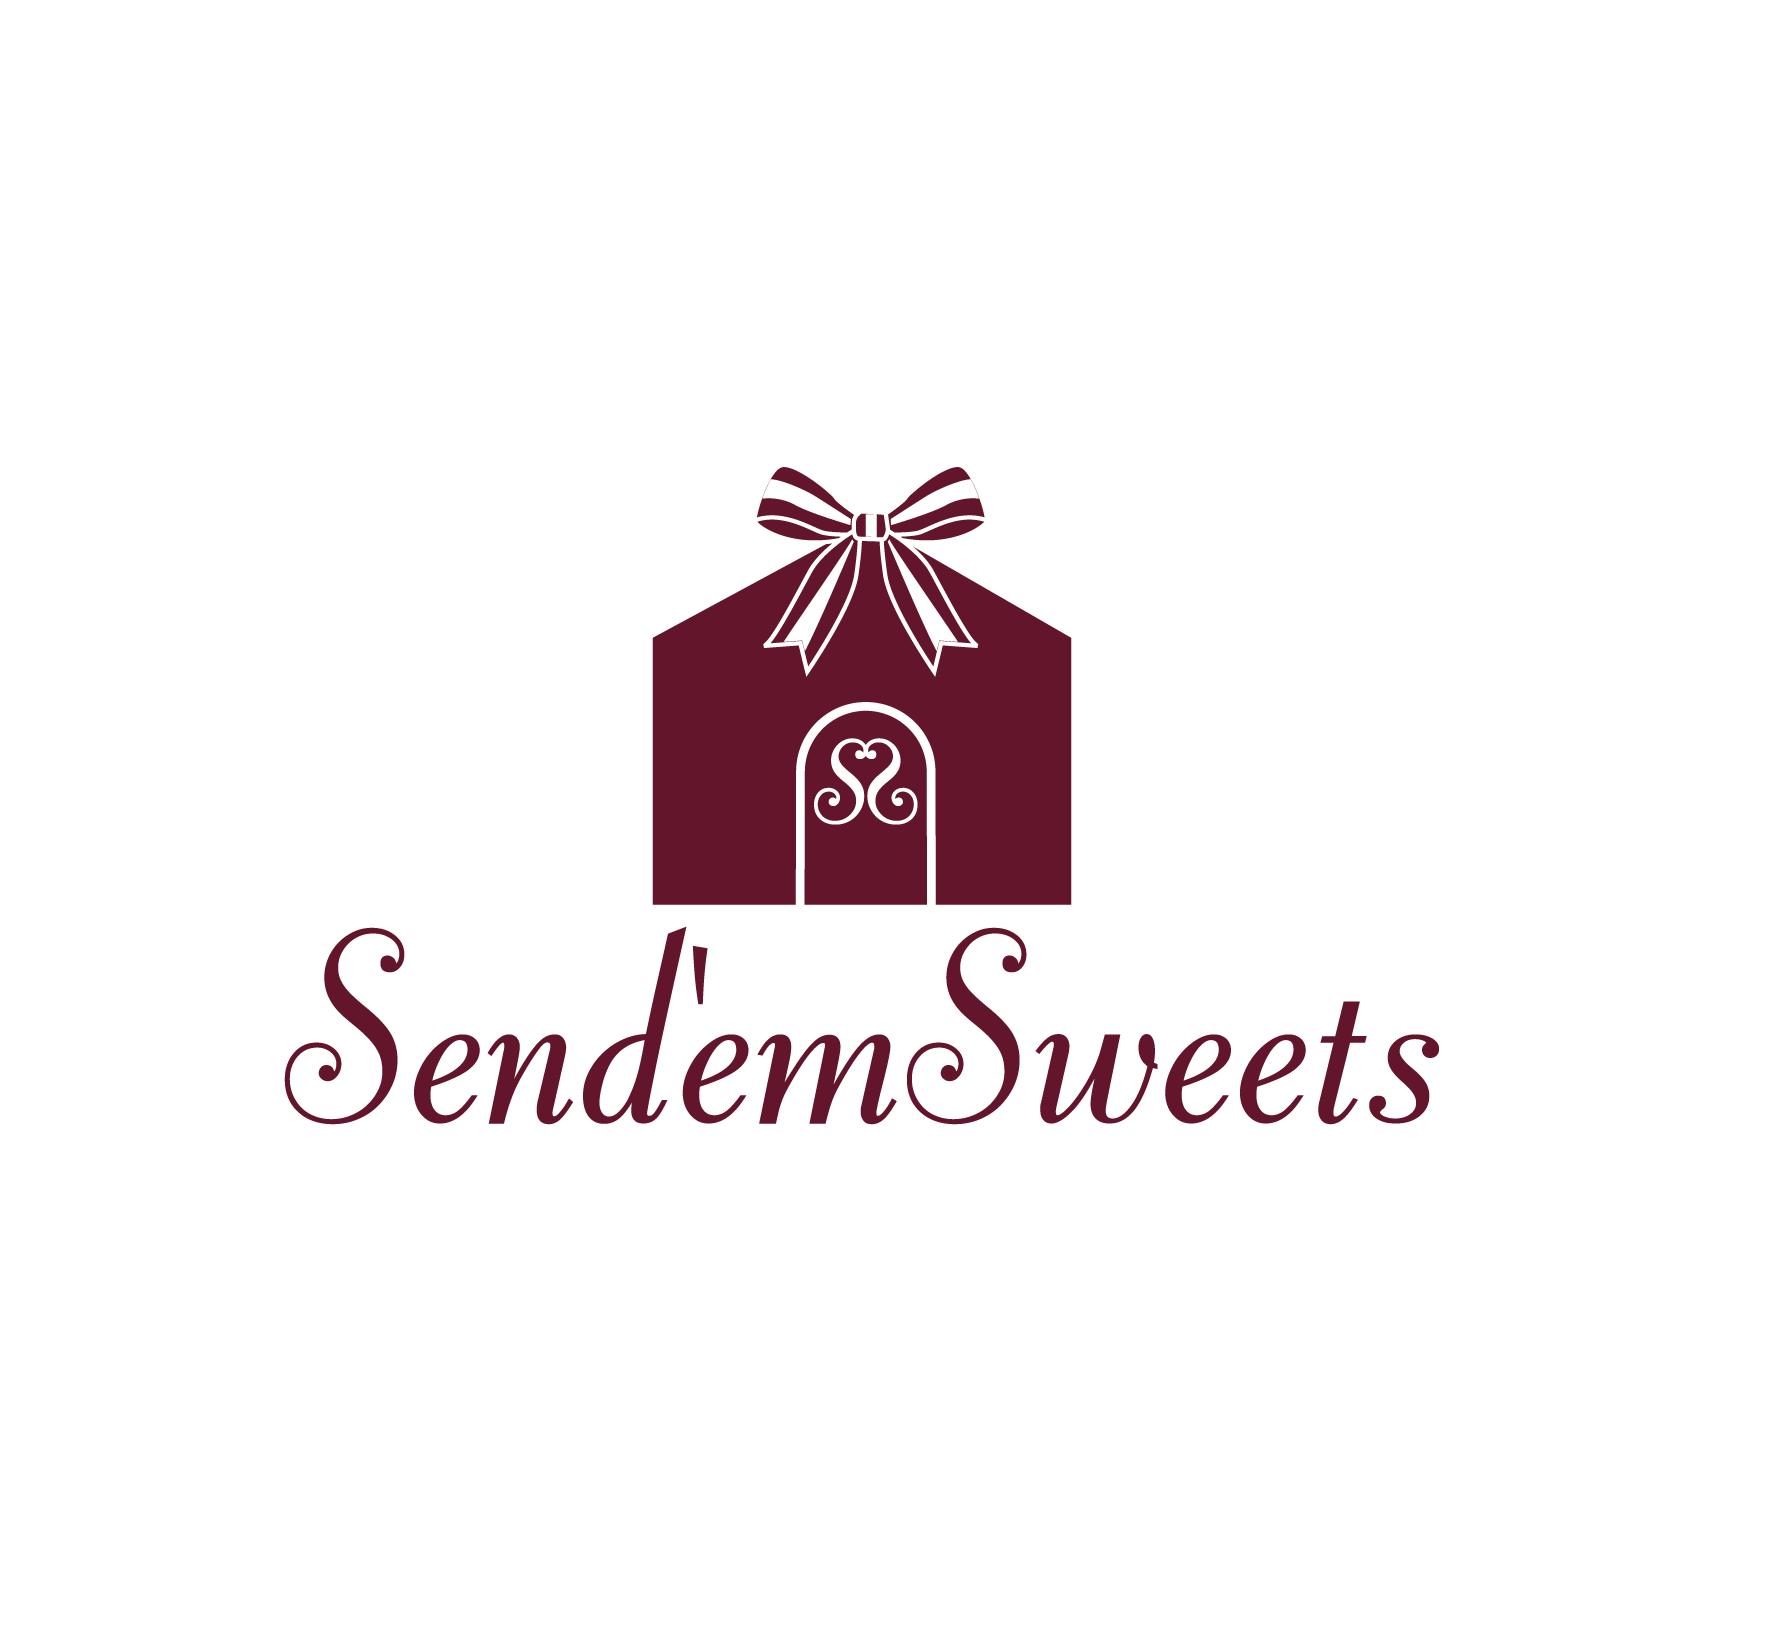 Logo Design by luna - Entry No. 39 in the Logo Design Contest Creative Logo Design for Send 'em Sweets.